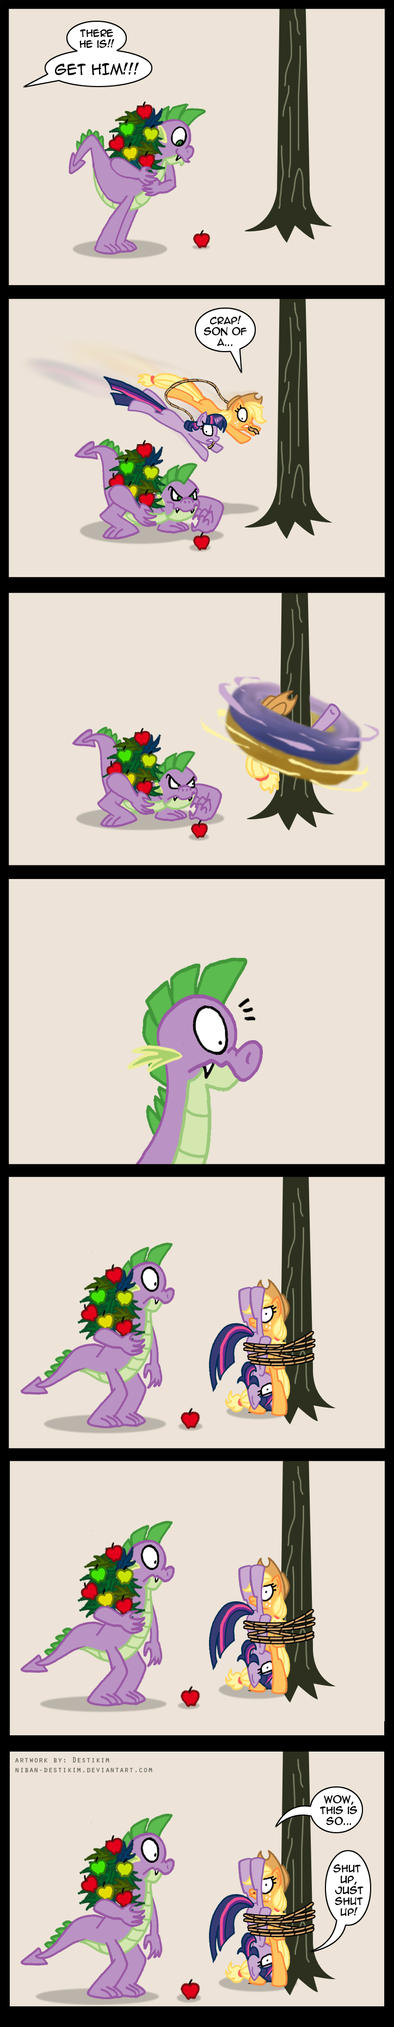 Lasso Spike by Niban-Destikim